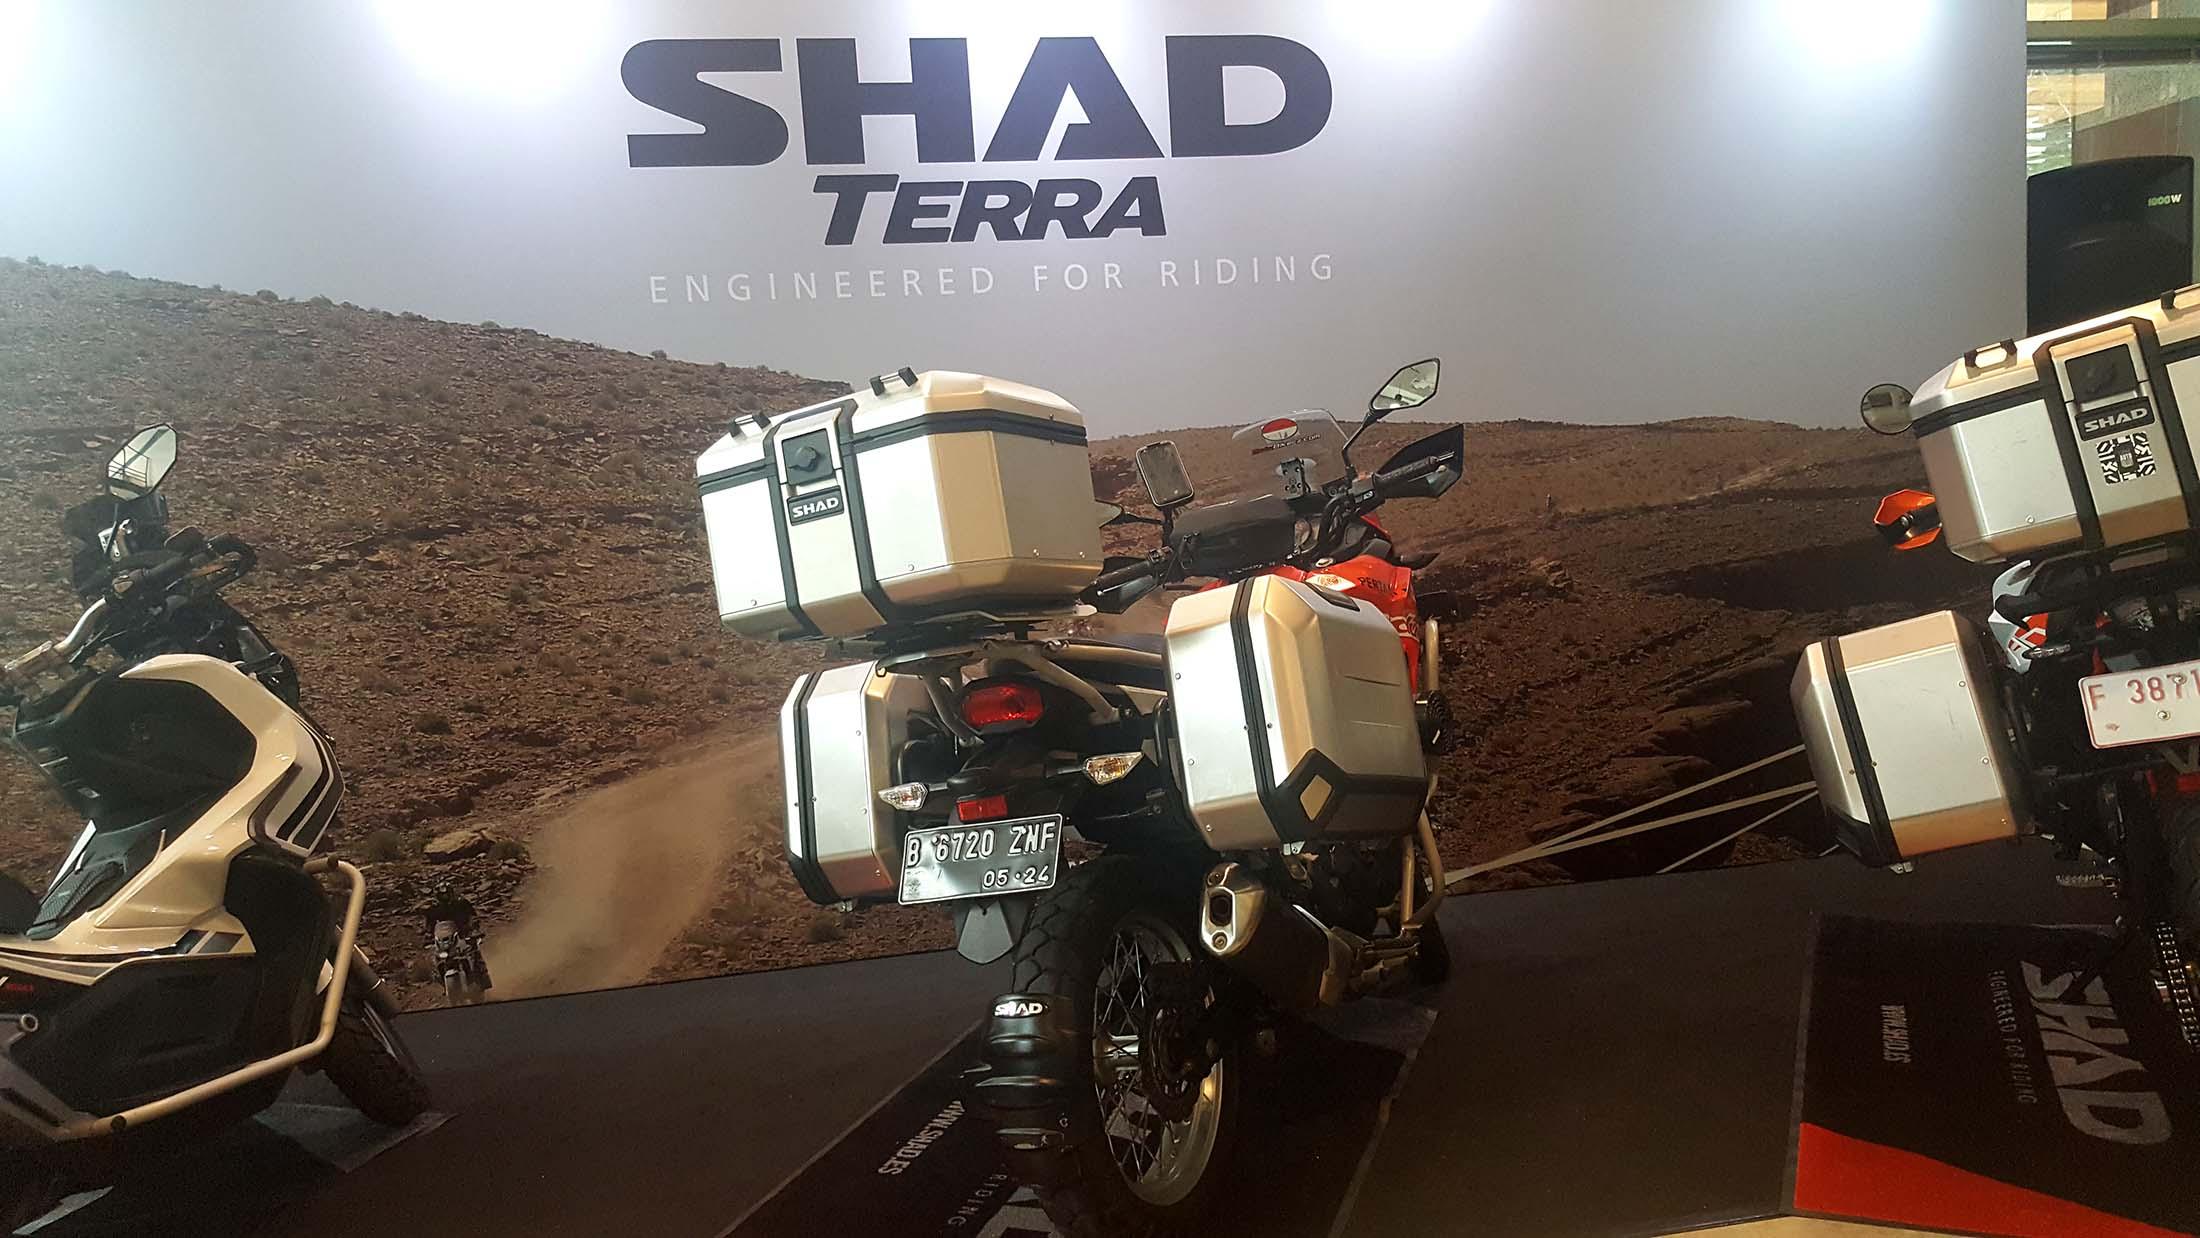 SHAD Luncurkan Alumunium Box Terra Untuk Bikers Indonesia